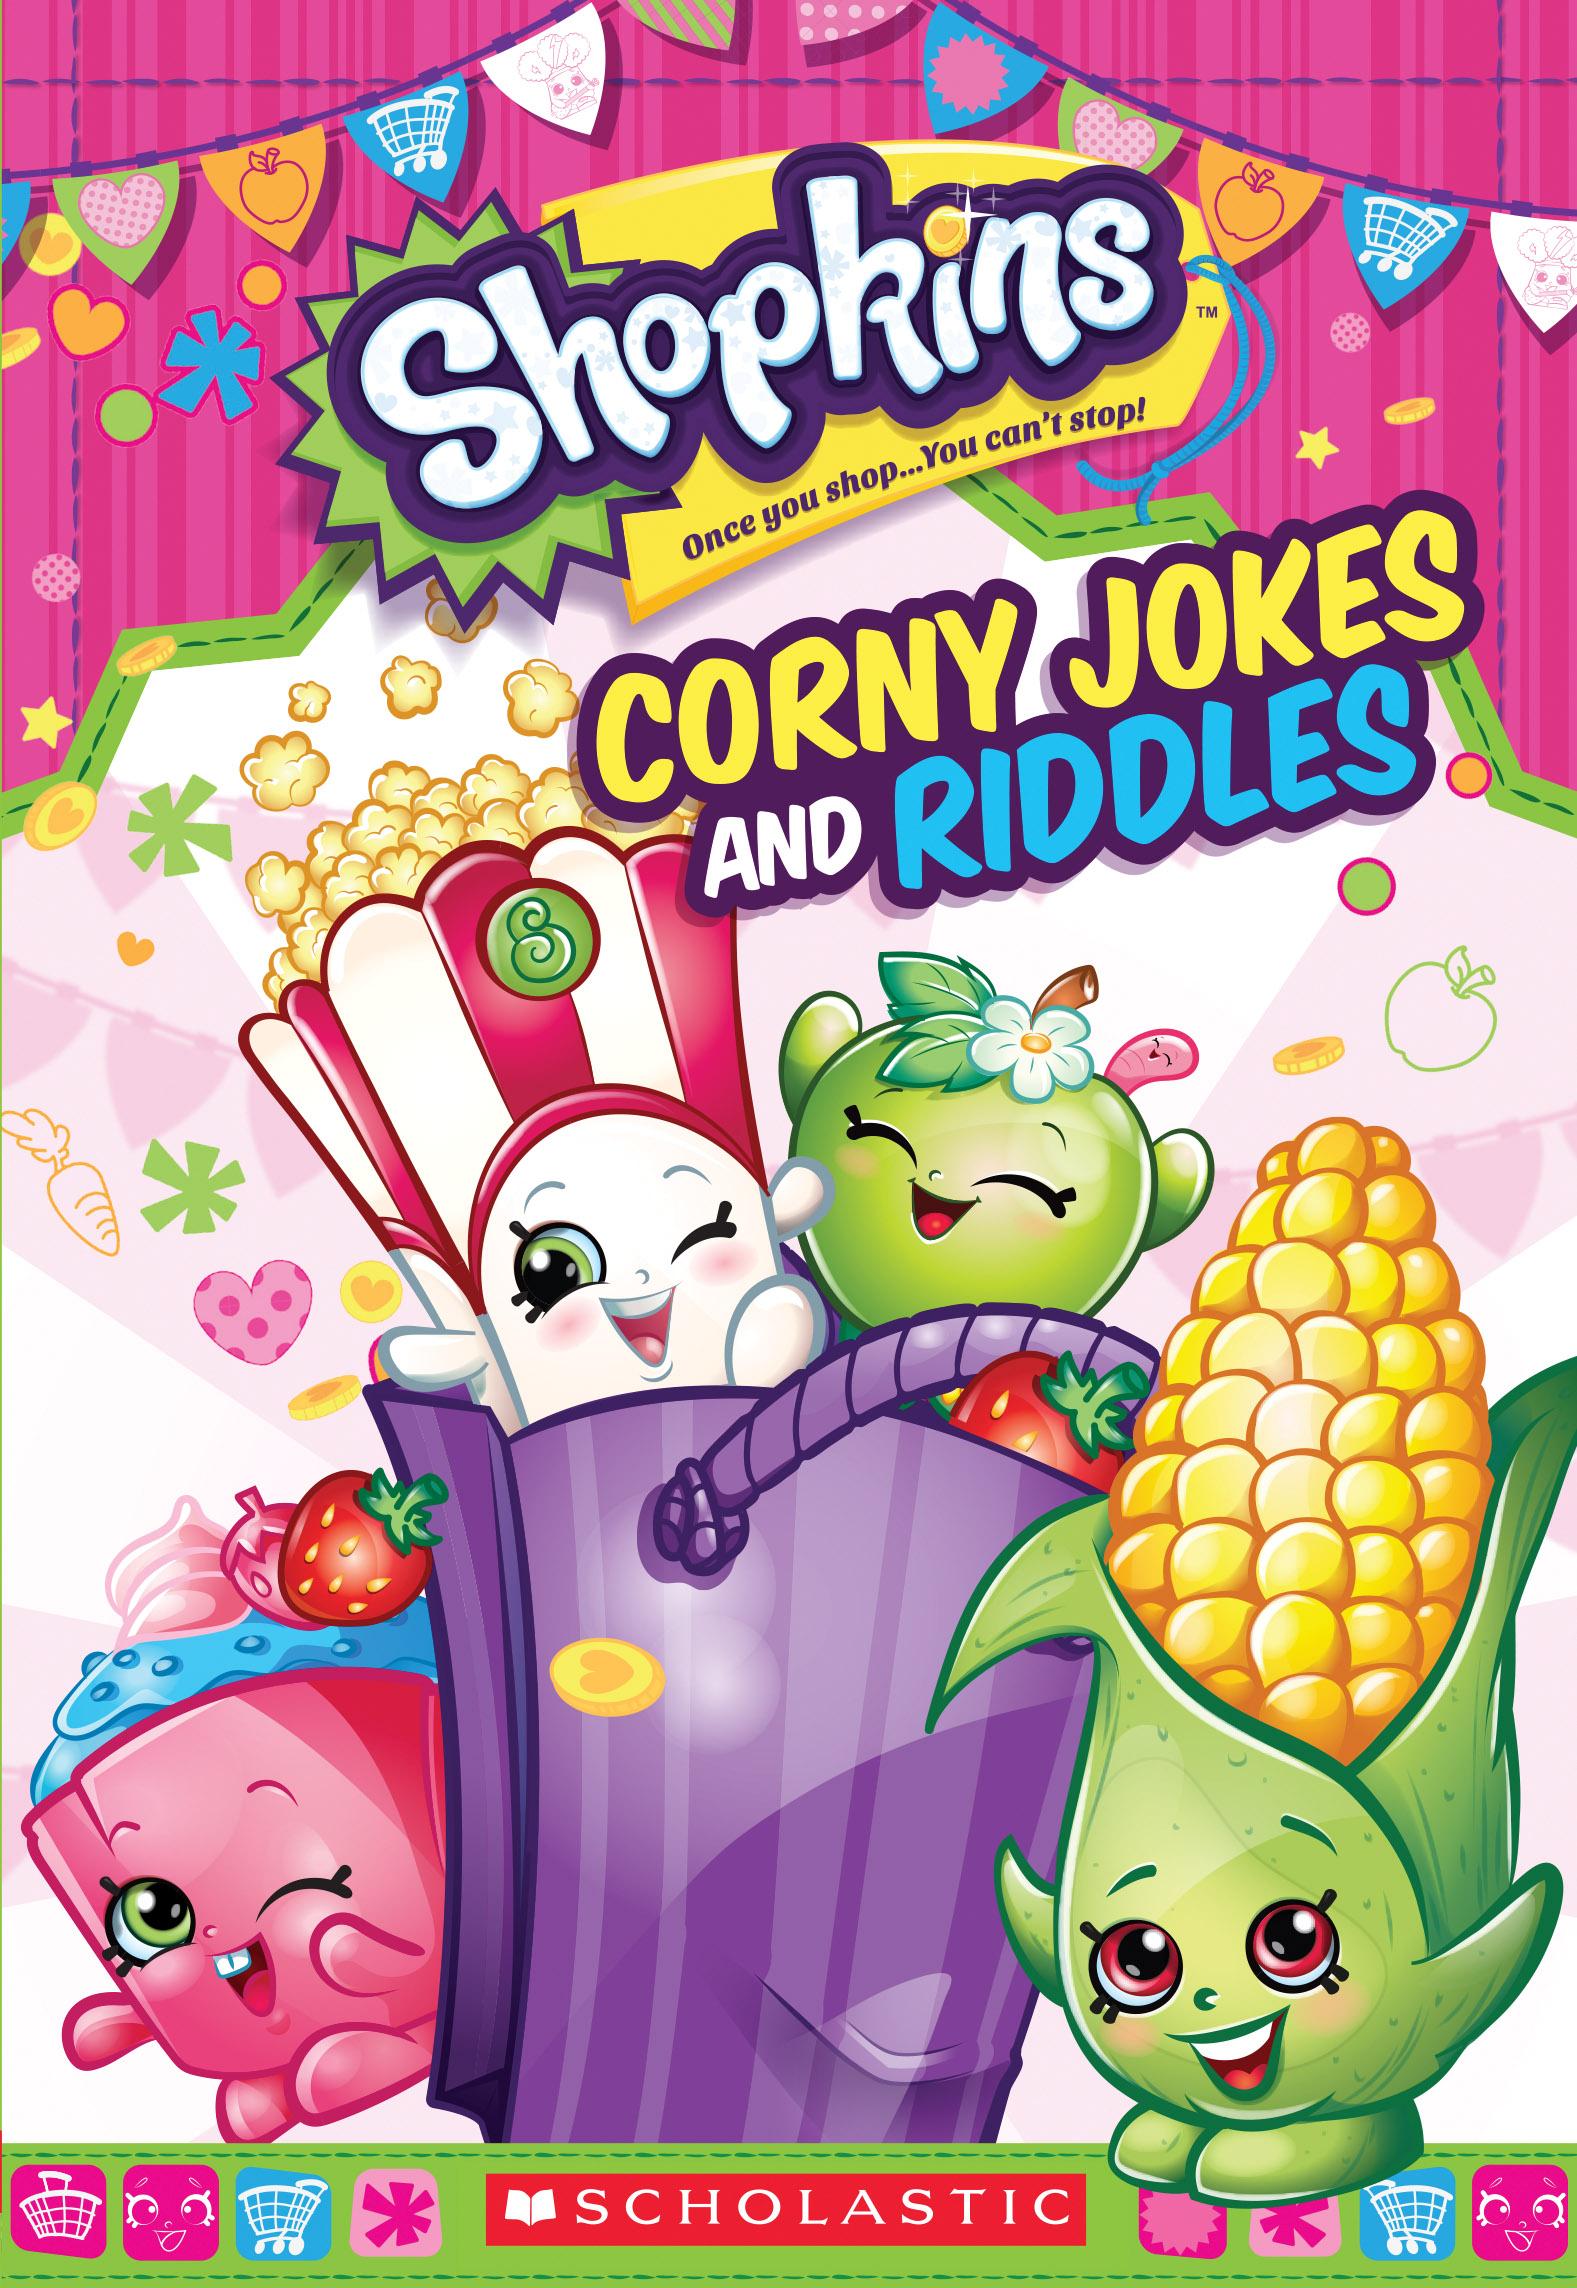 Shopkins: Corny Jokes And Riddles